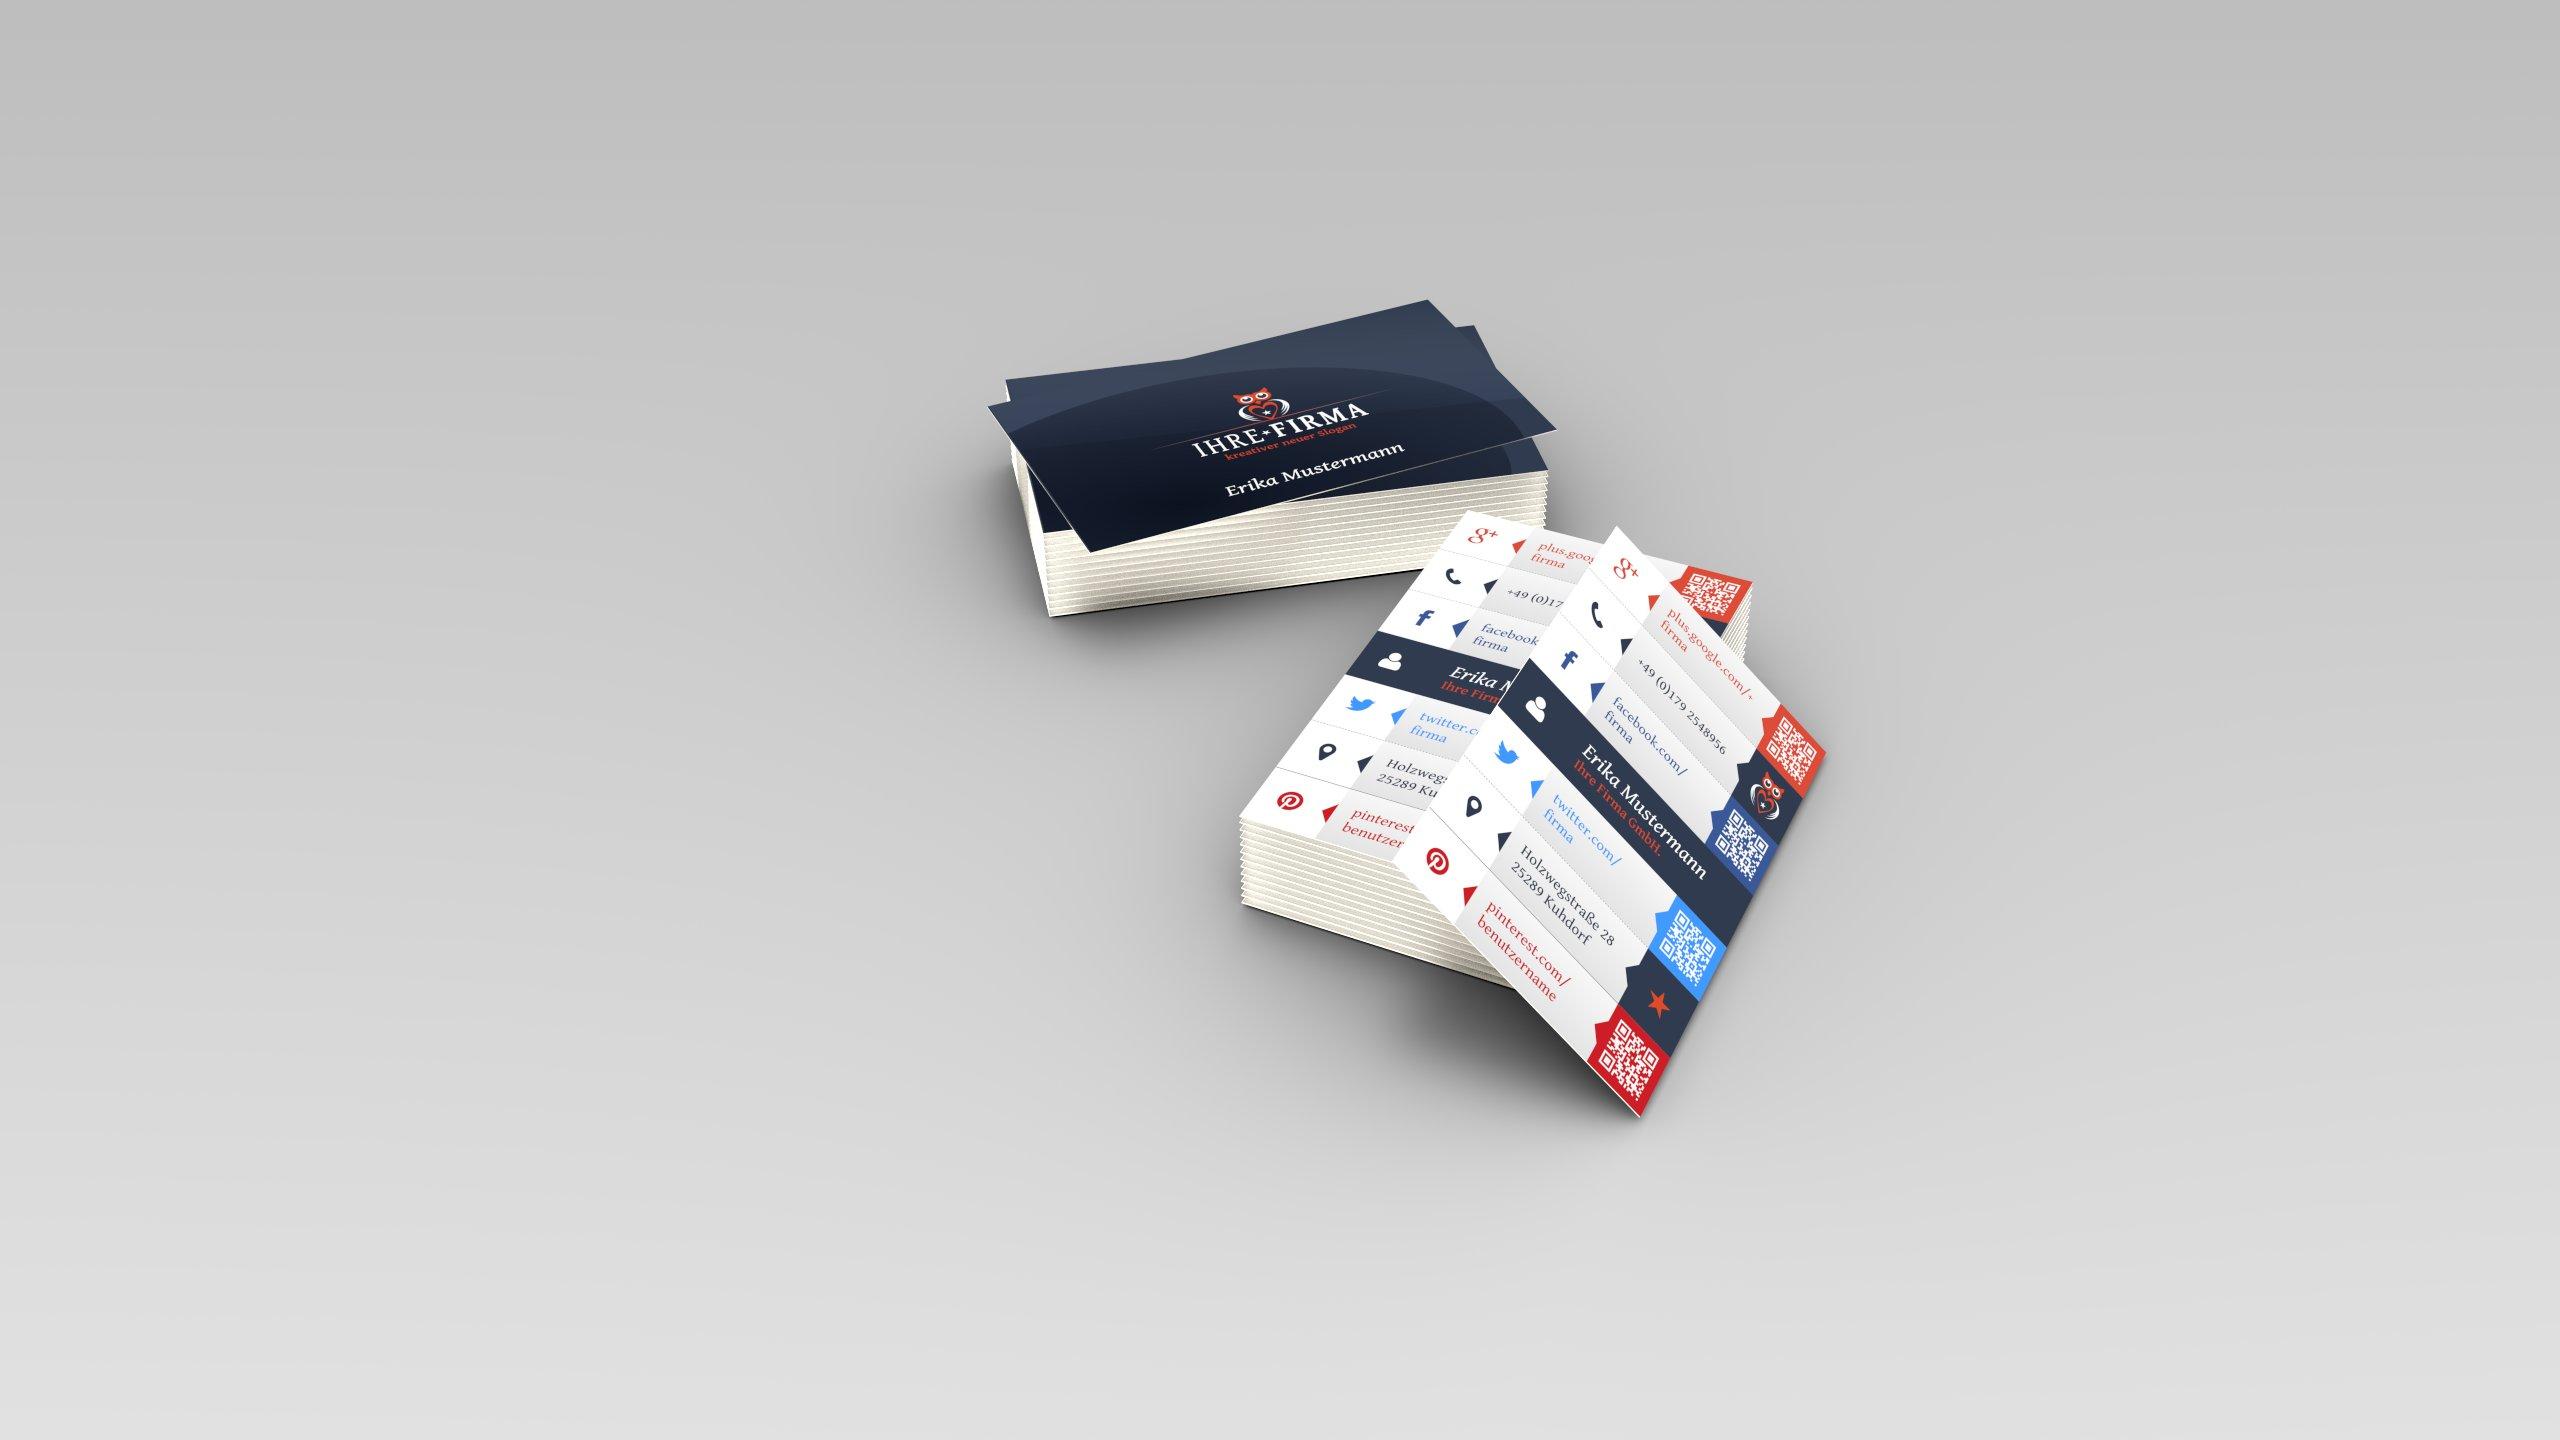 3D-Grafik Blender - Visitenkarten Gestaltung